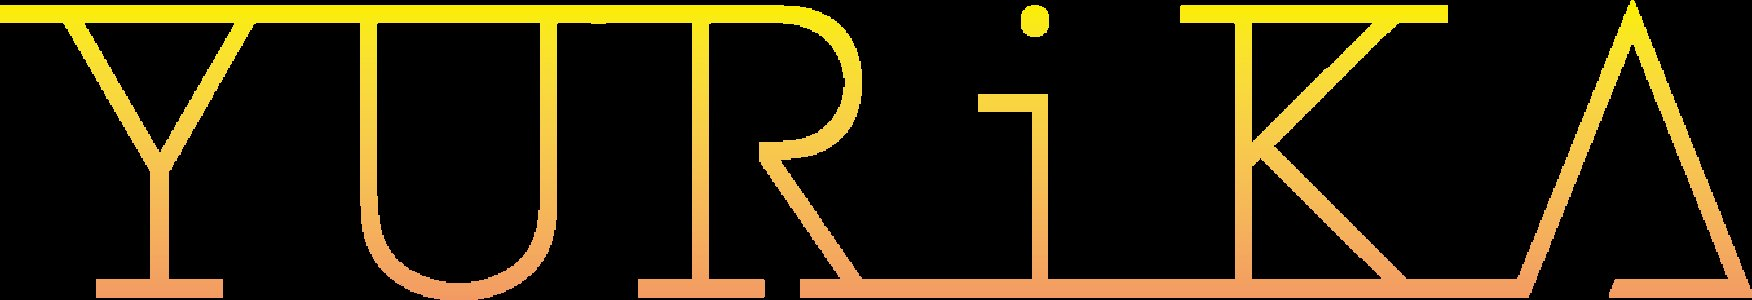 TVアニメ「BEASTARS」エンディングテーマ発売記念イベント アニメイト池袋本店 全曲ライブ&CDサイン会